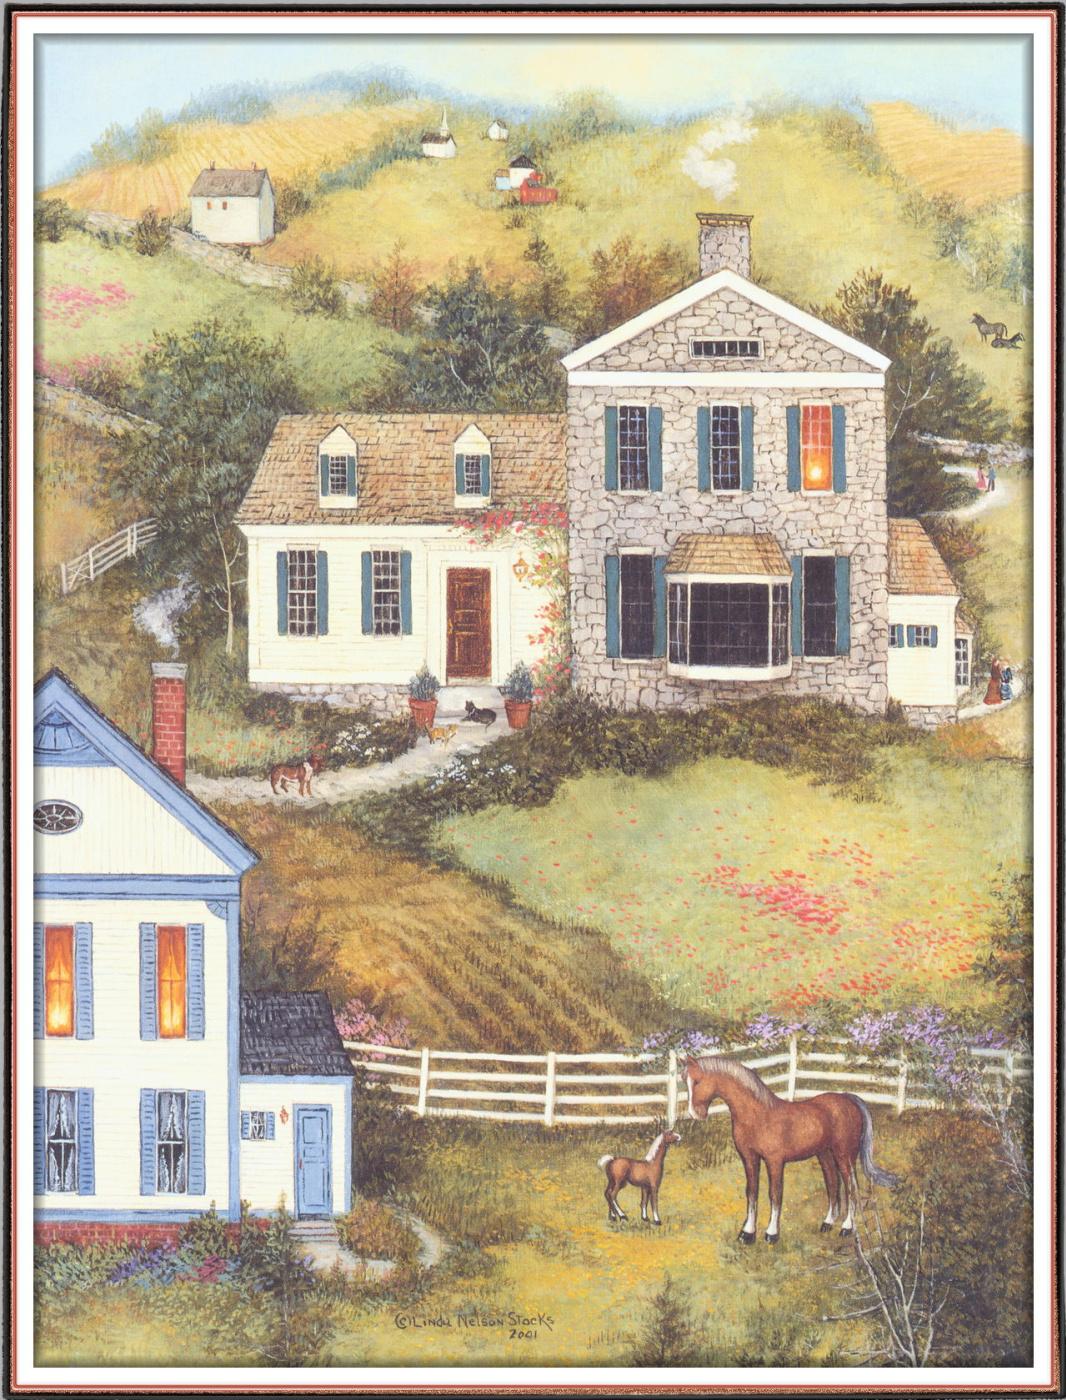 Linda Nelson Stokes. Home